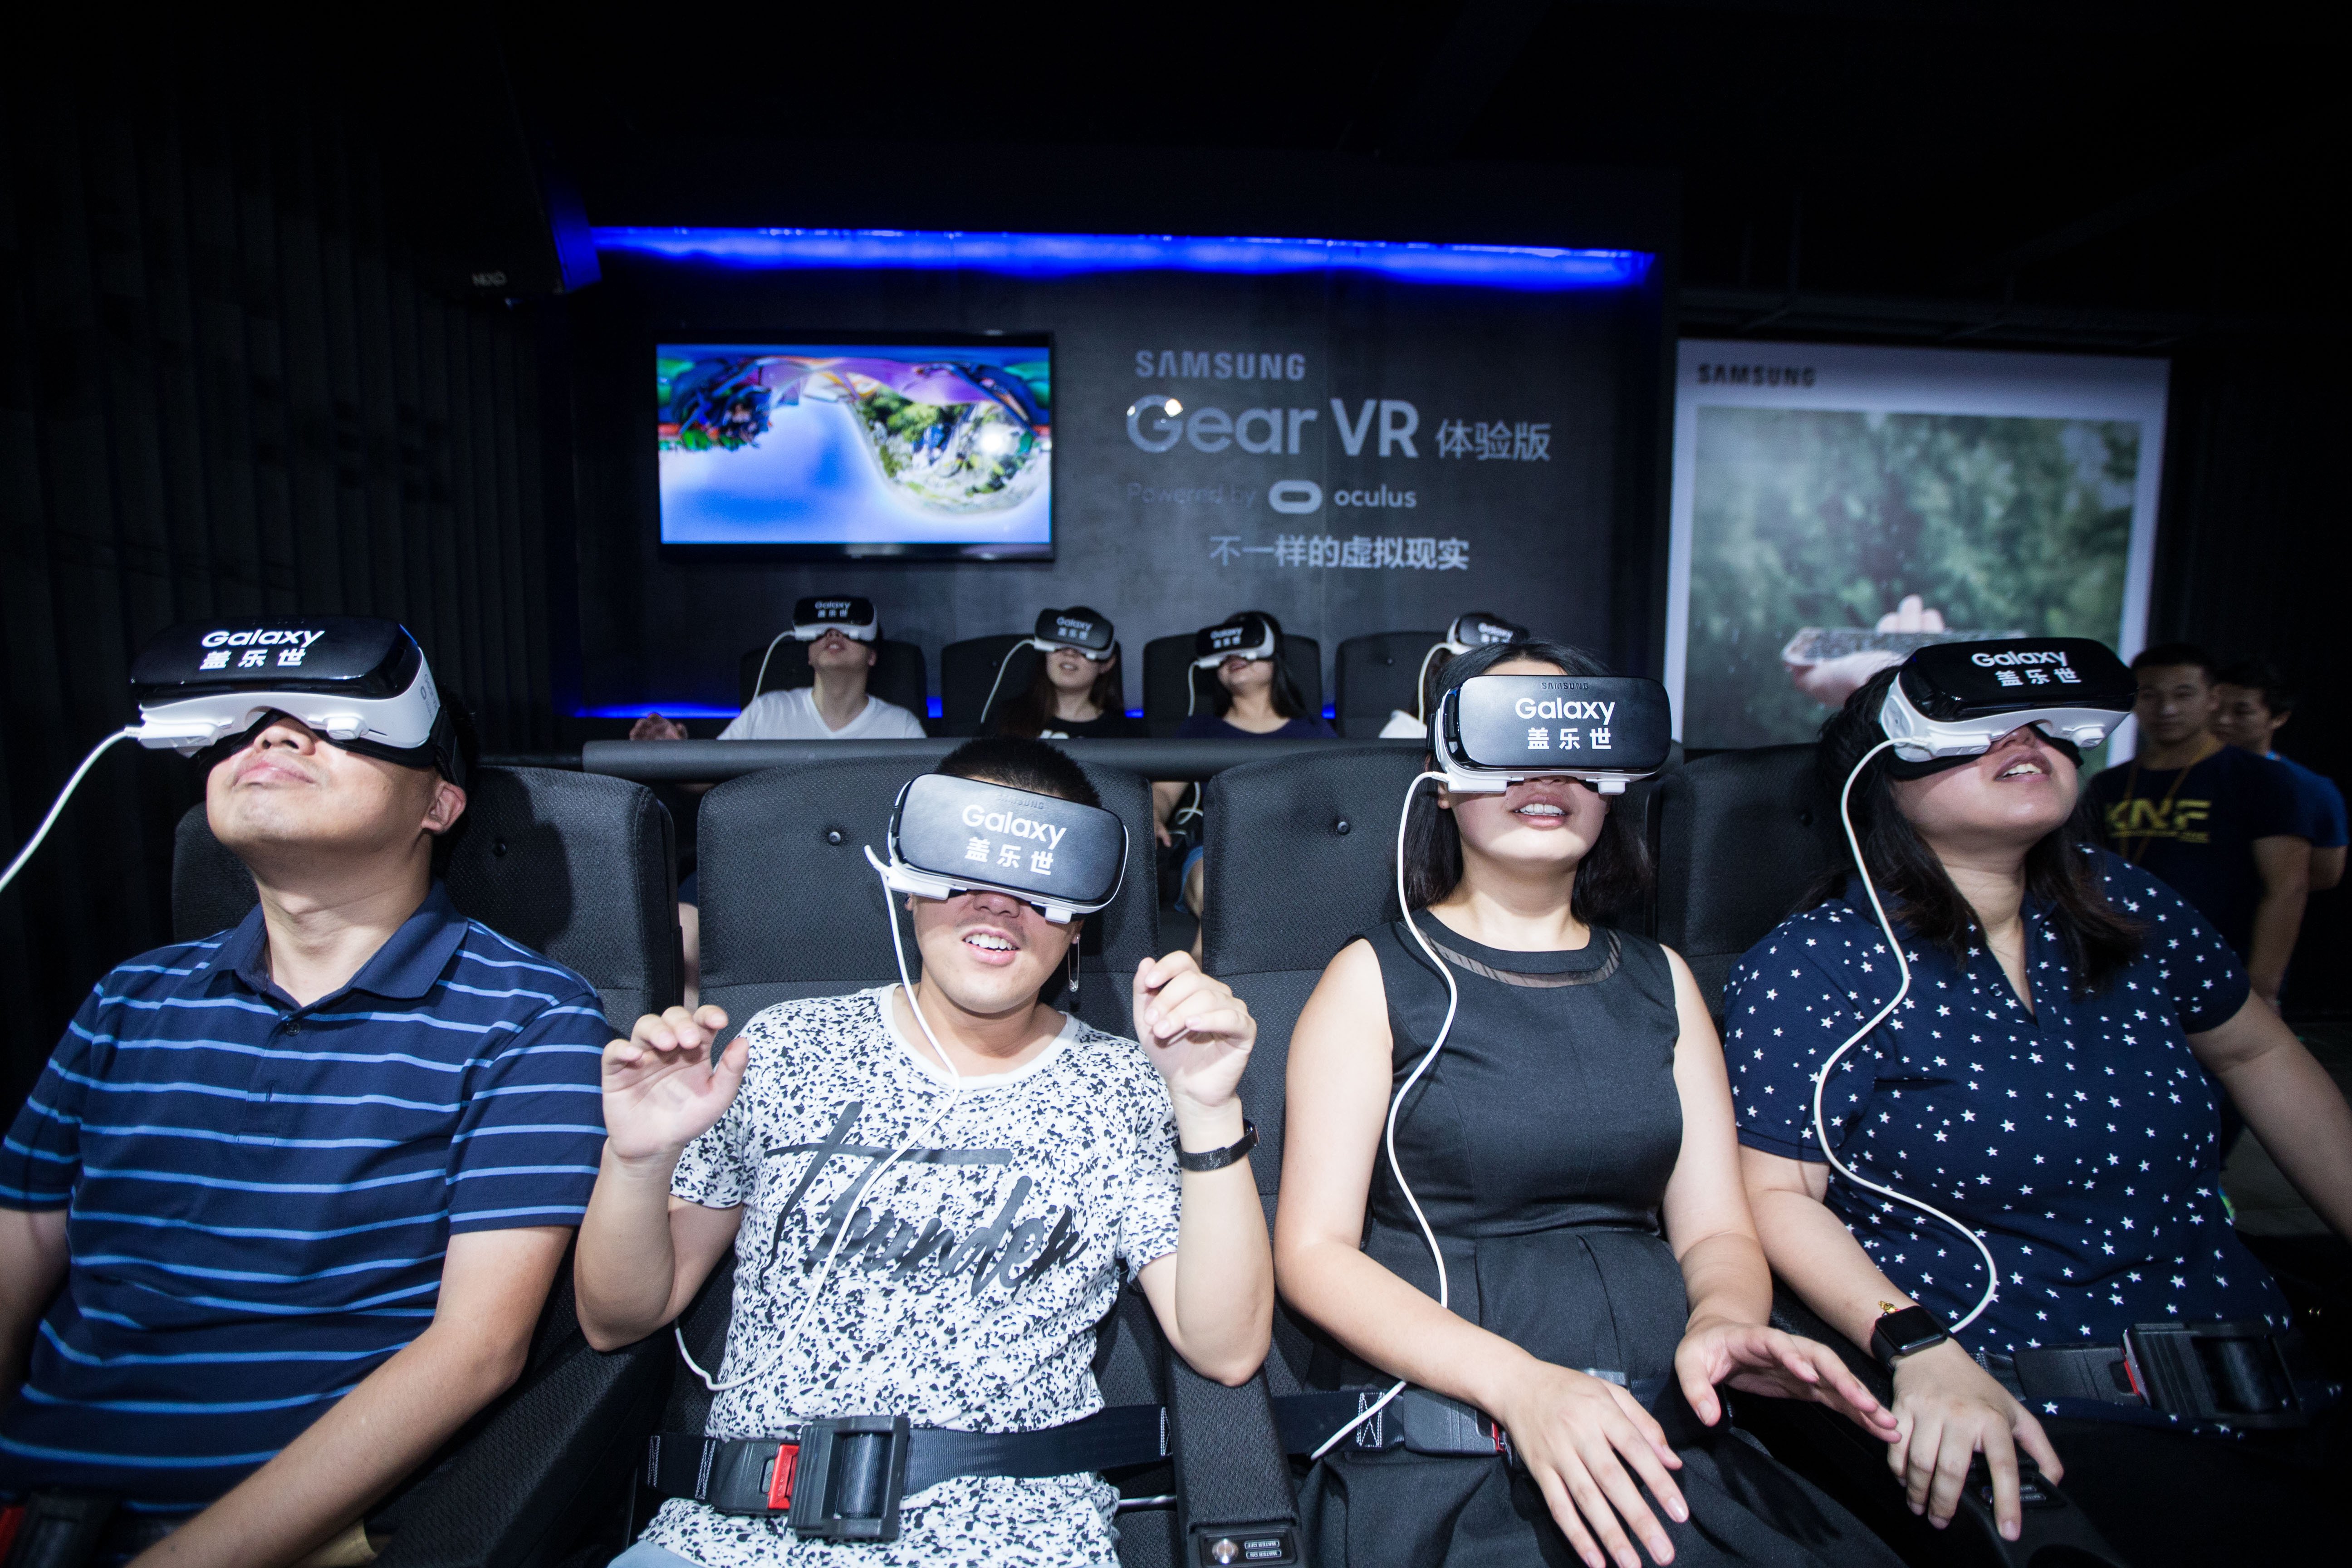 Alibaba Group Hosts Inaugural Taobao Maker Festival In Shanghai